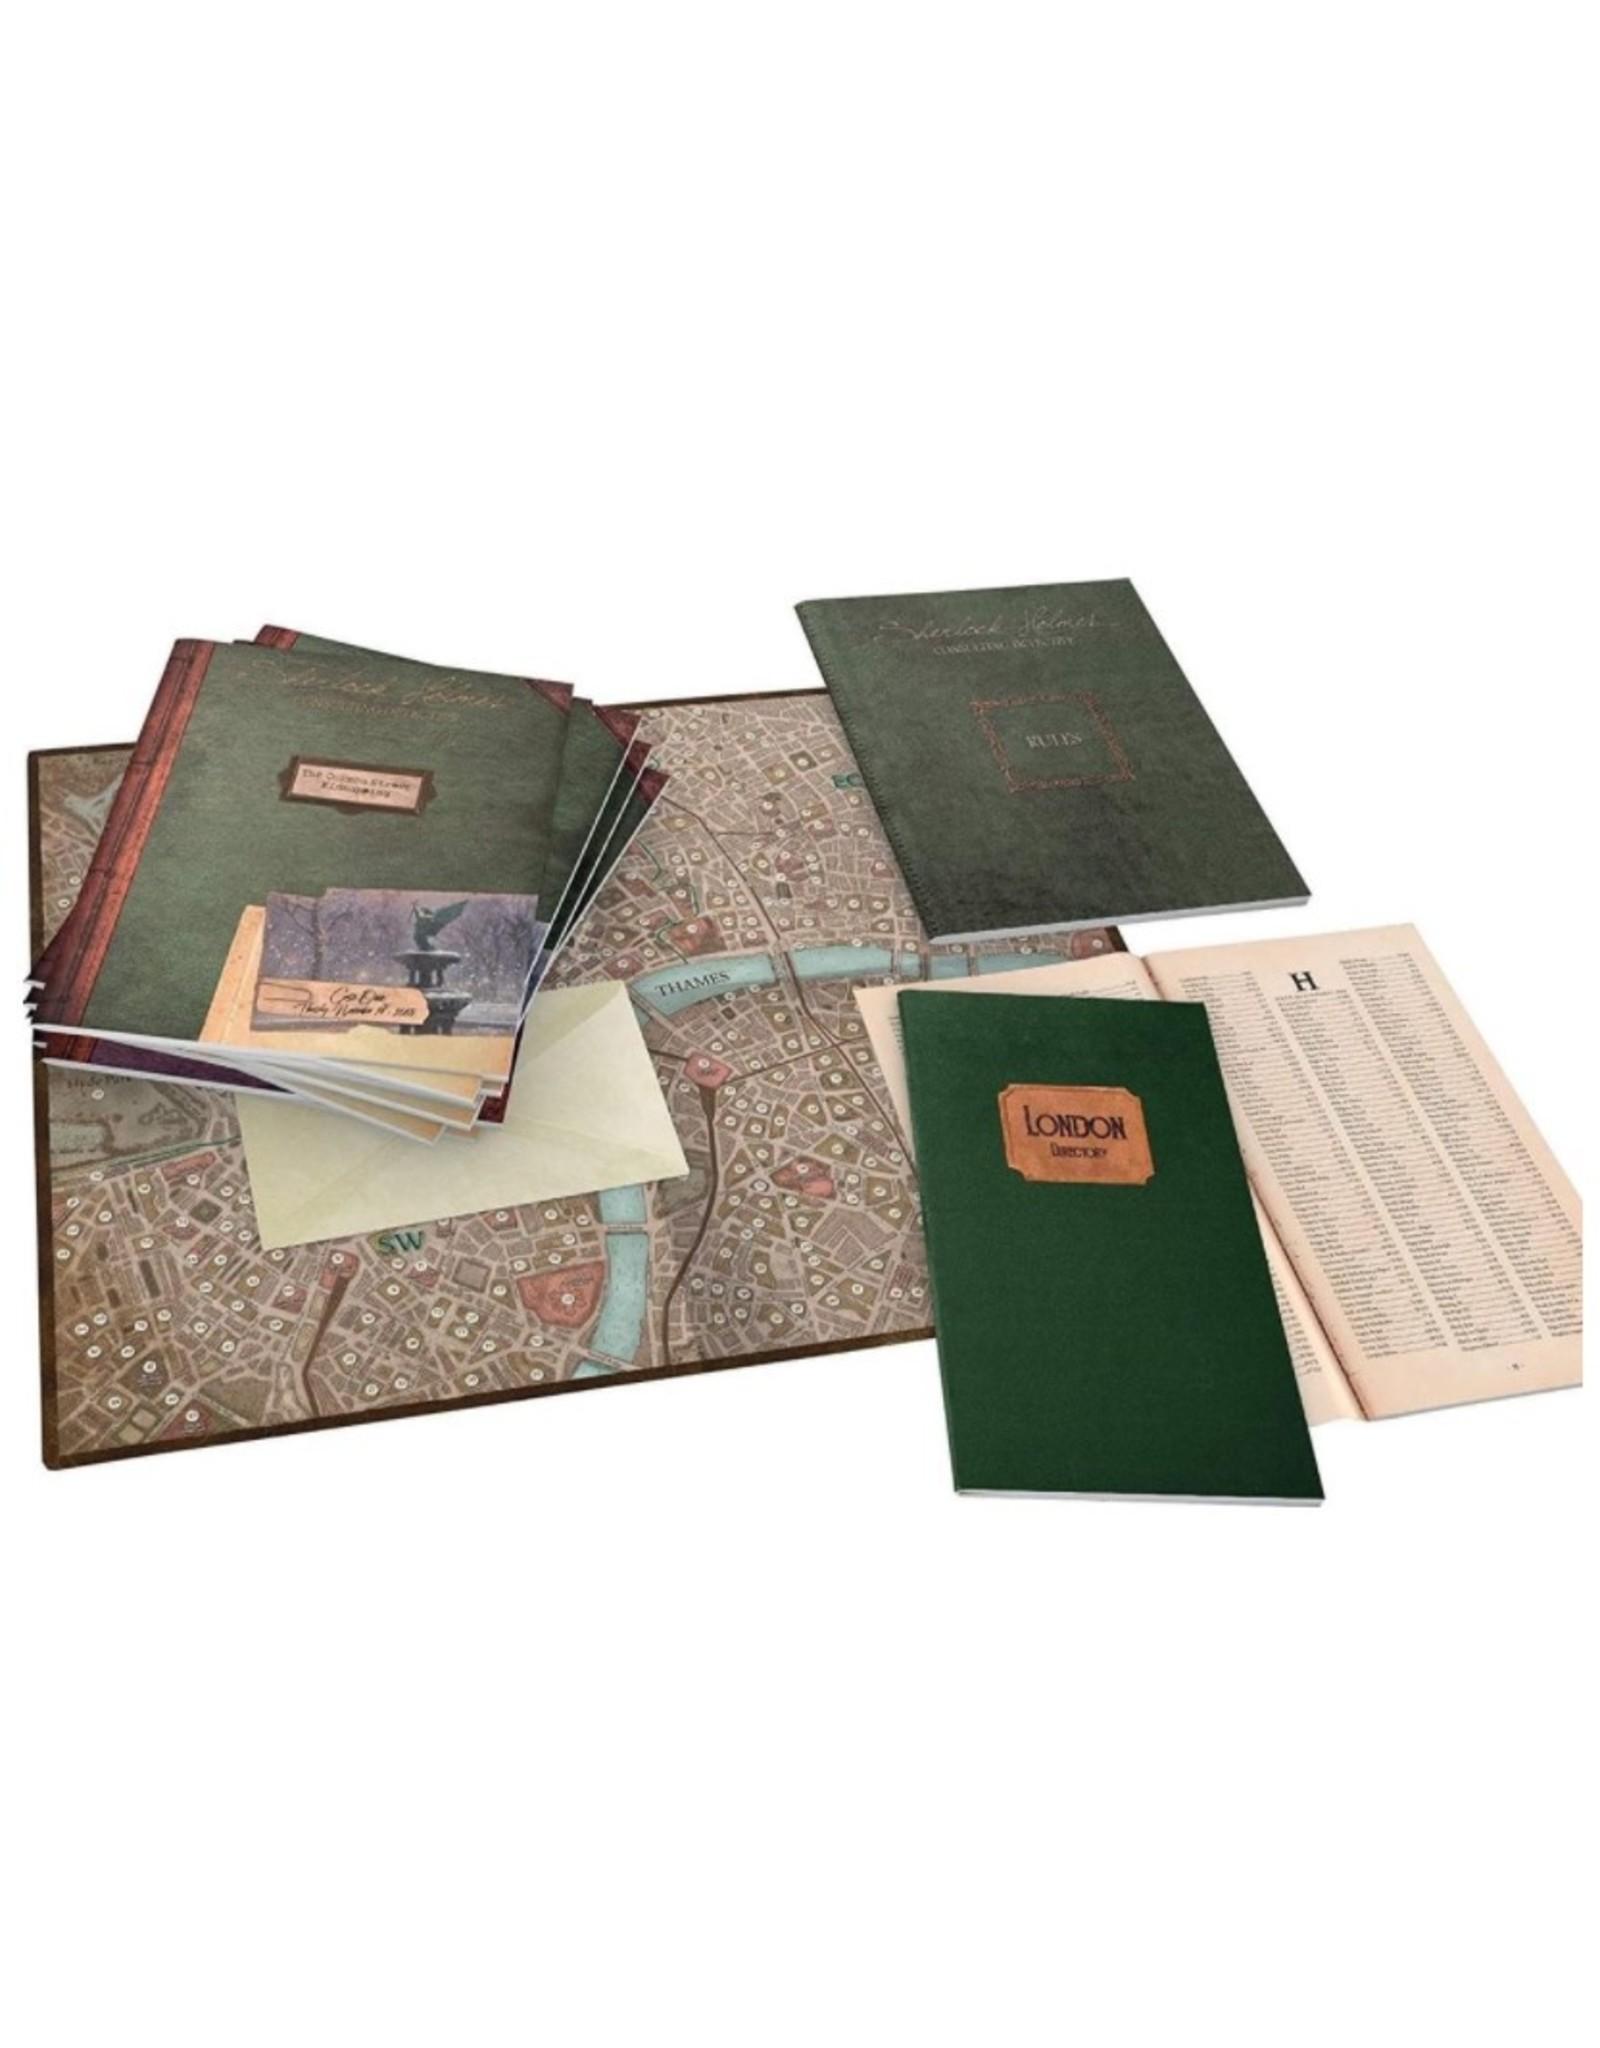 Sherlock Holmes Consulting Detective - The Baker Street Irregulars